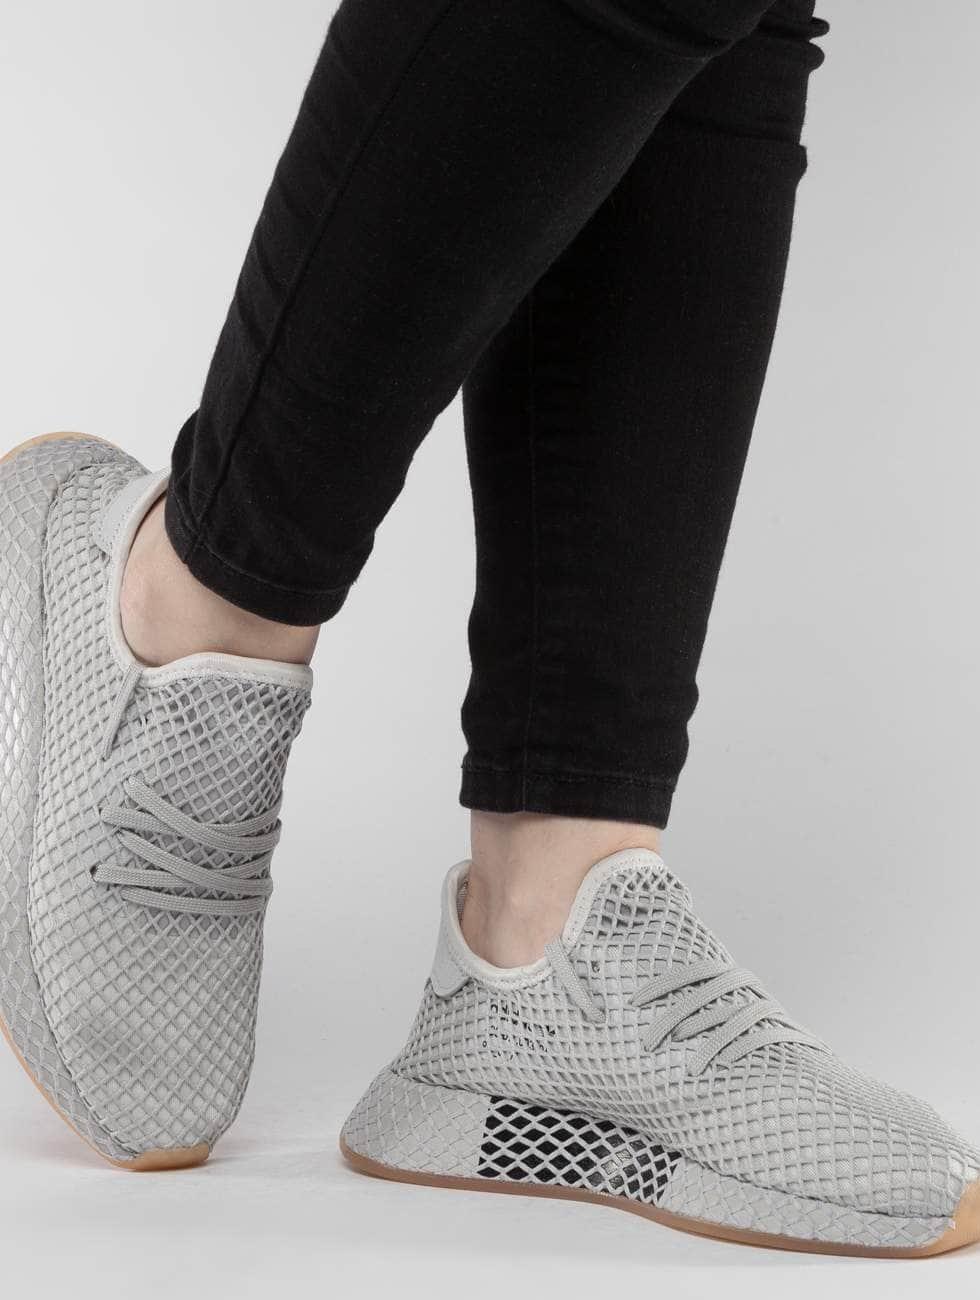 Adidas Originals Sko / Joggesko Deerupt Løper I Grå 409 946 Klaring Rask Levering kLuPBS0cXl